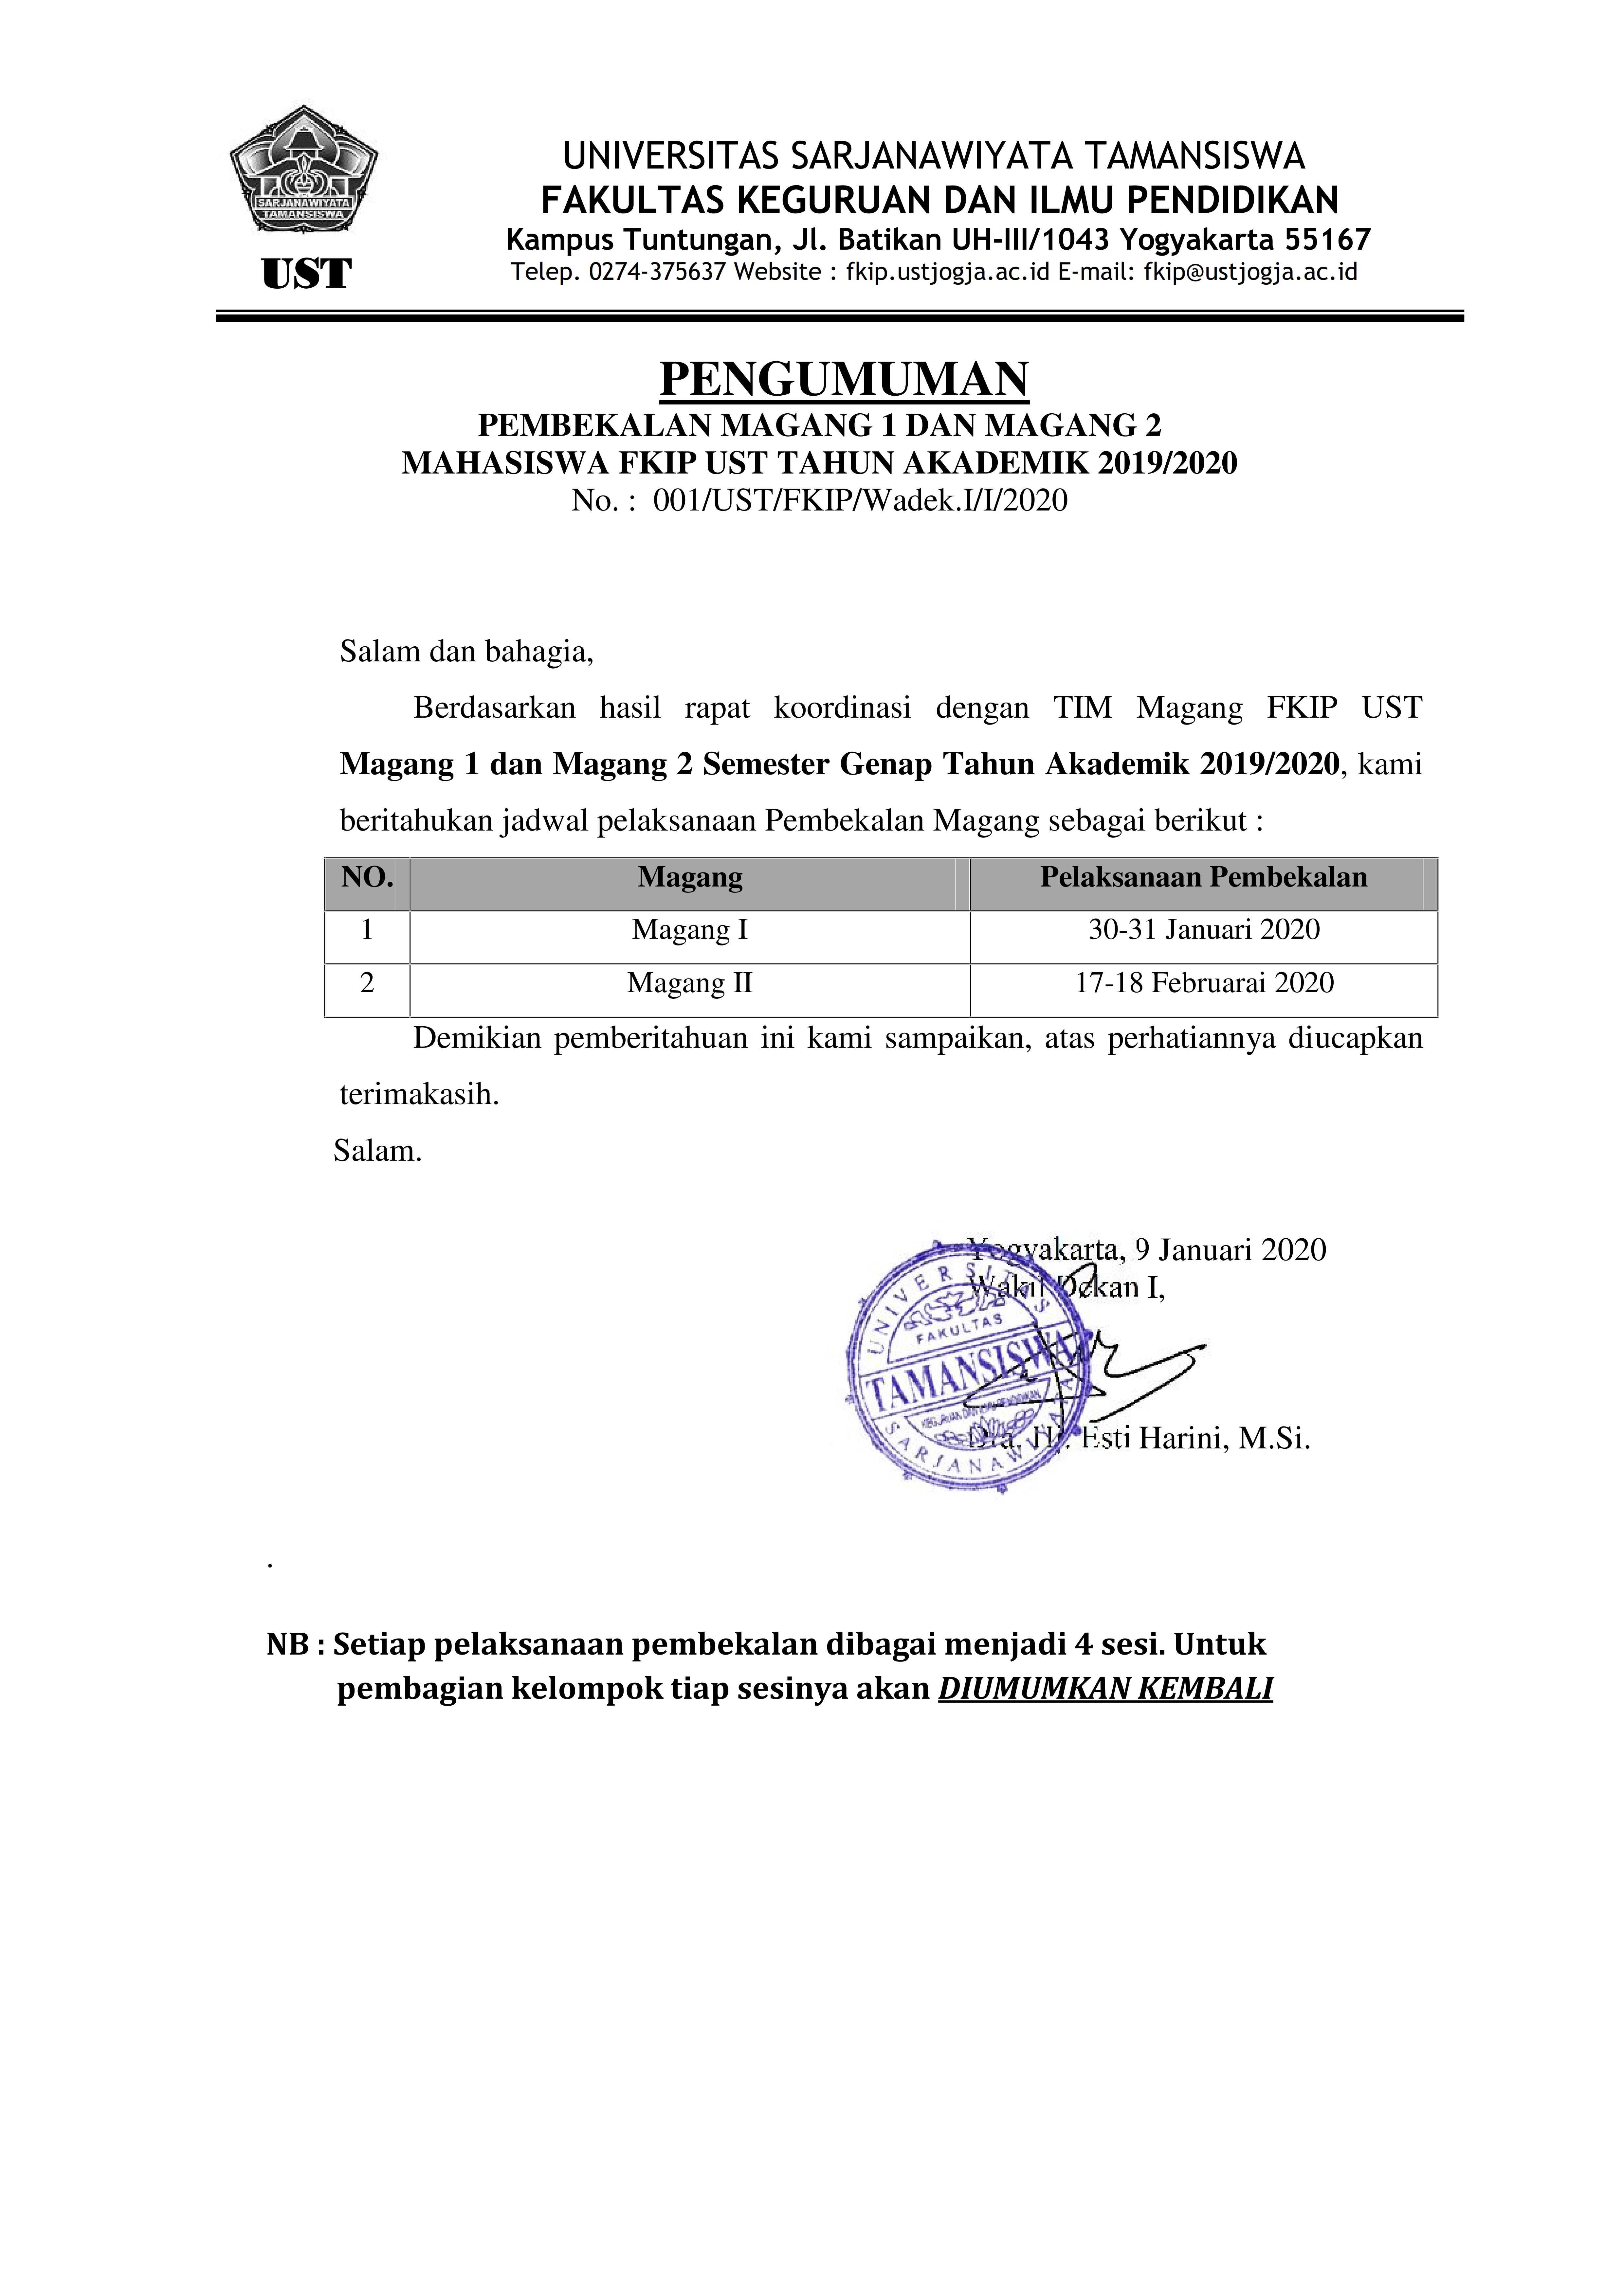 Pemberitahuan Pembekalan Magang I dan Magang II Tahun Akademik 2019/2020